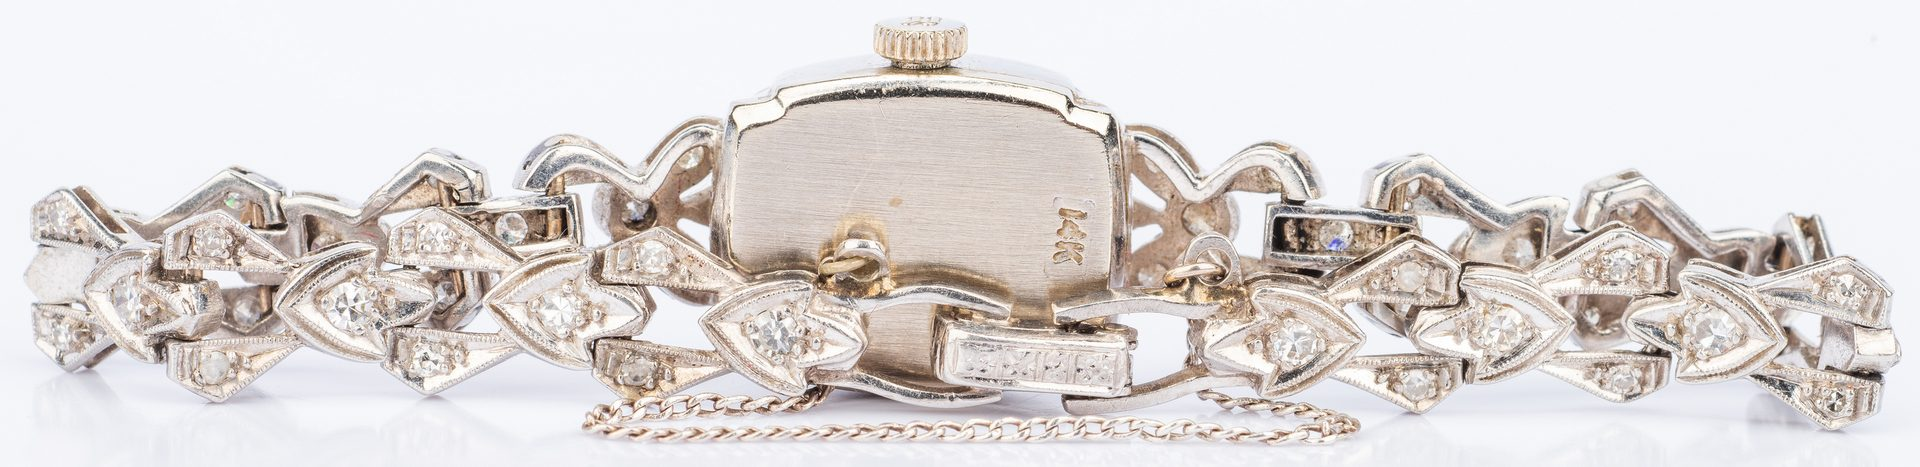 Lot 394: Ladies 14K Diamond Bracelet Watch